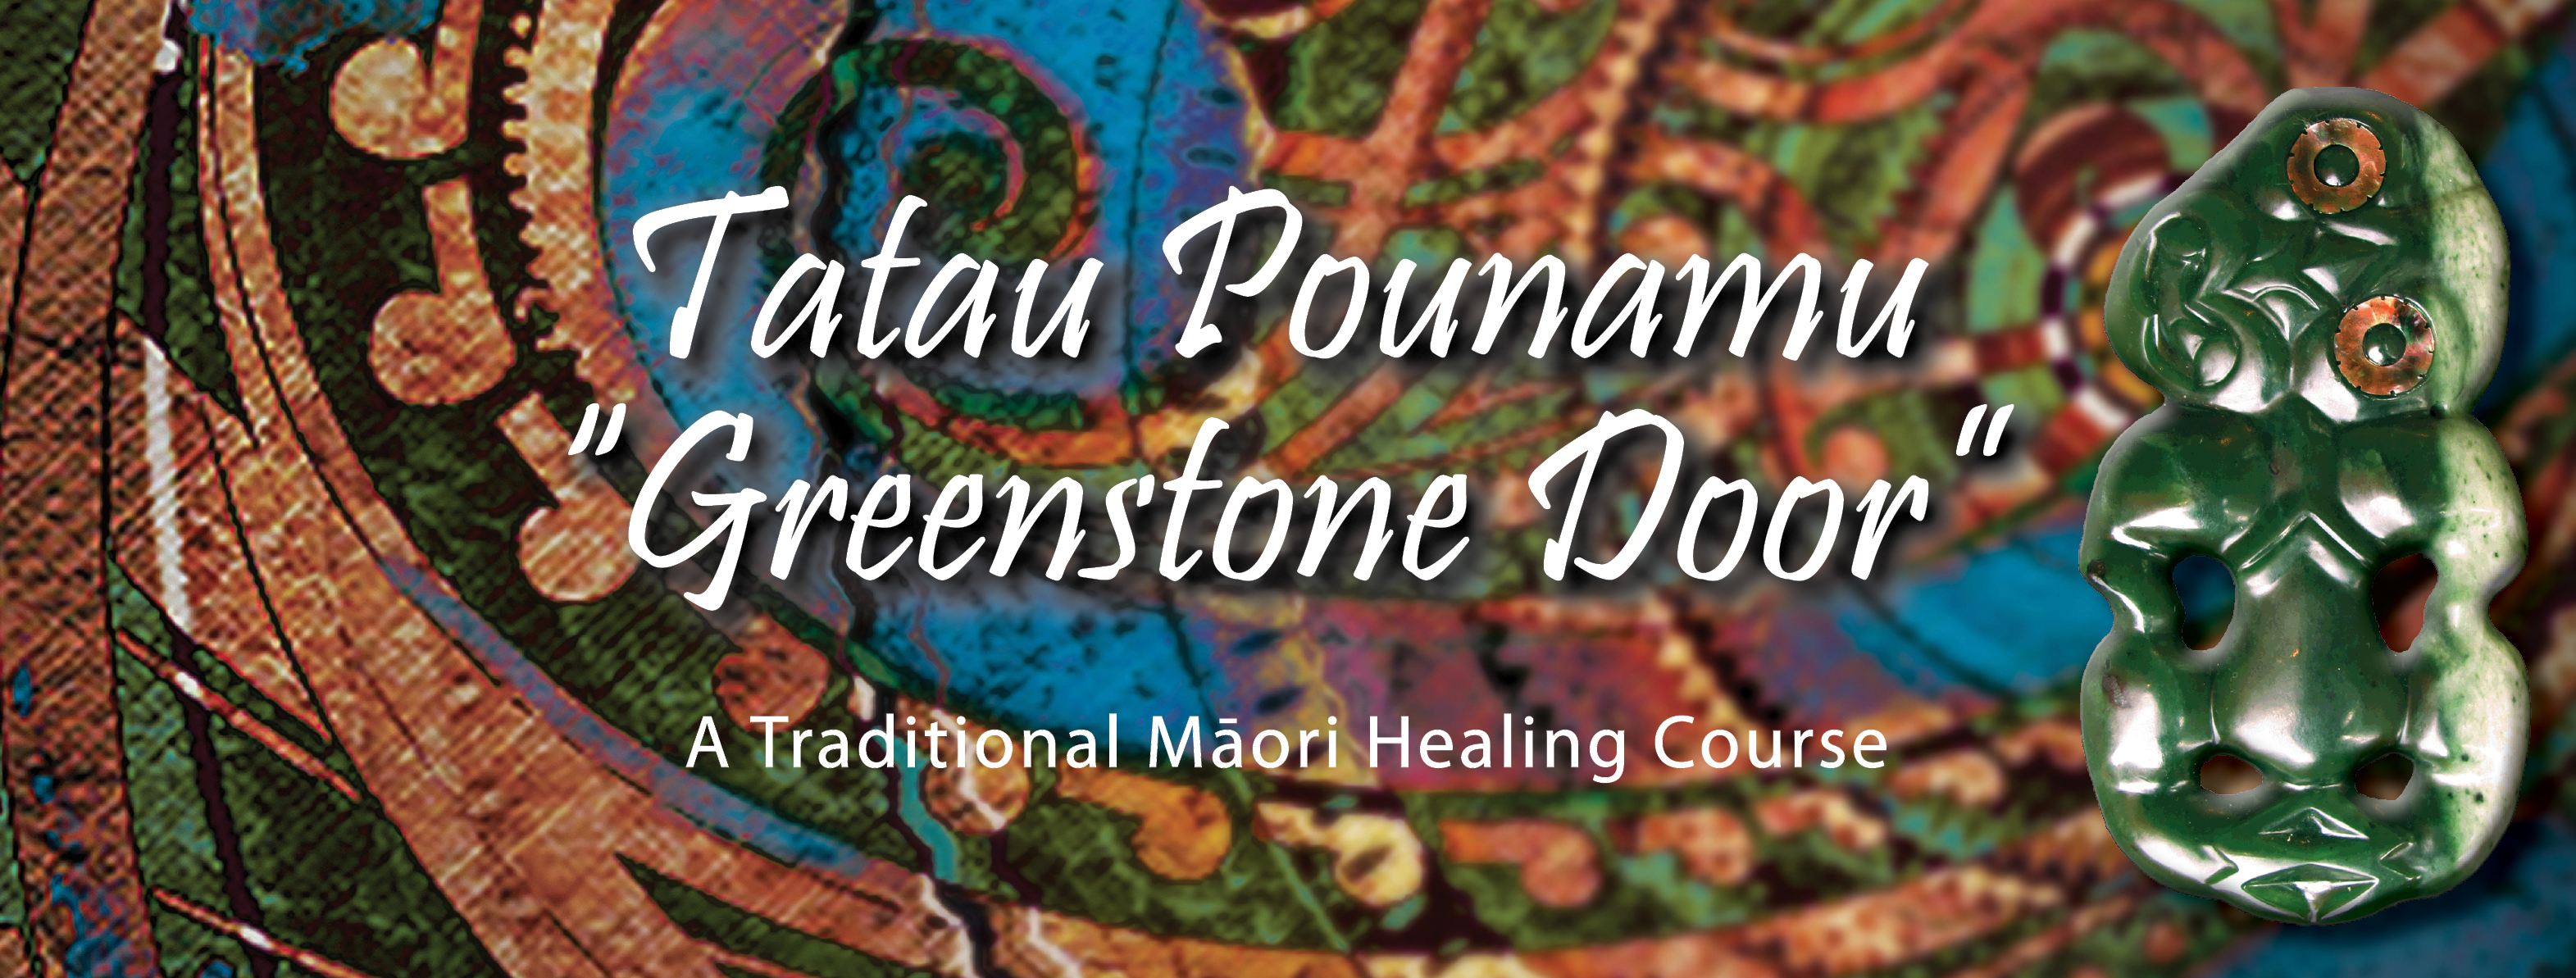 kawaipurapura-maori-healing-course-2018-event-banner